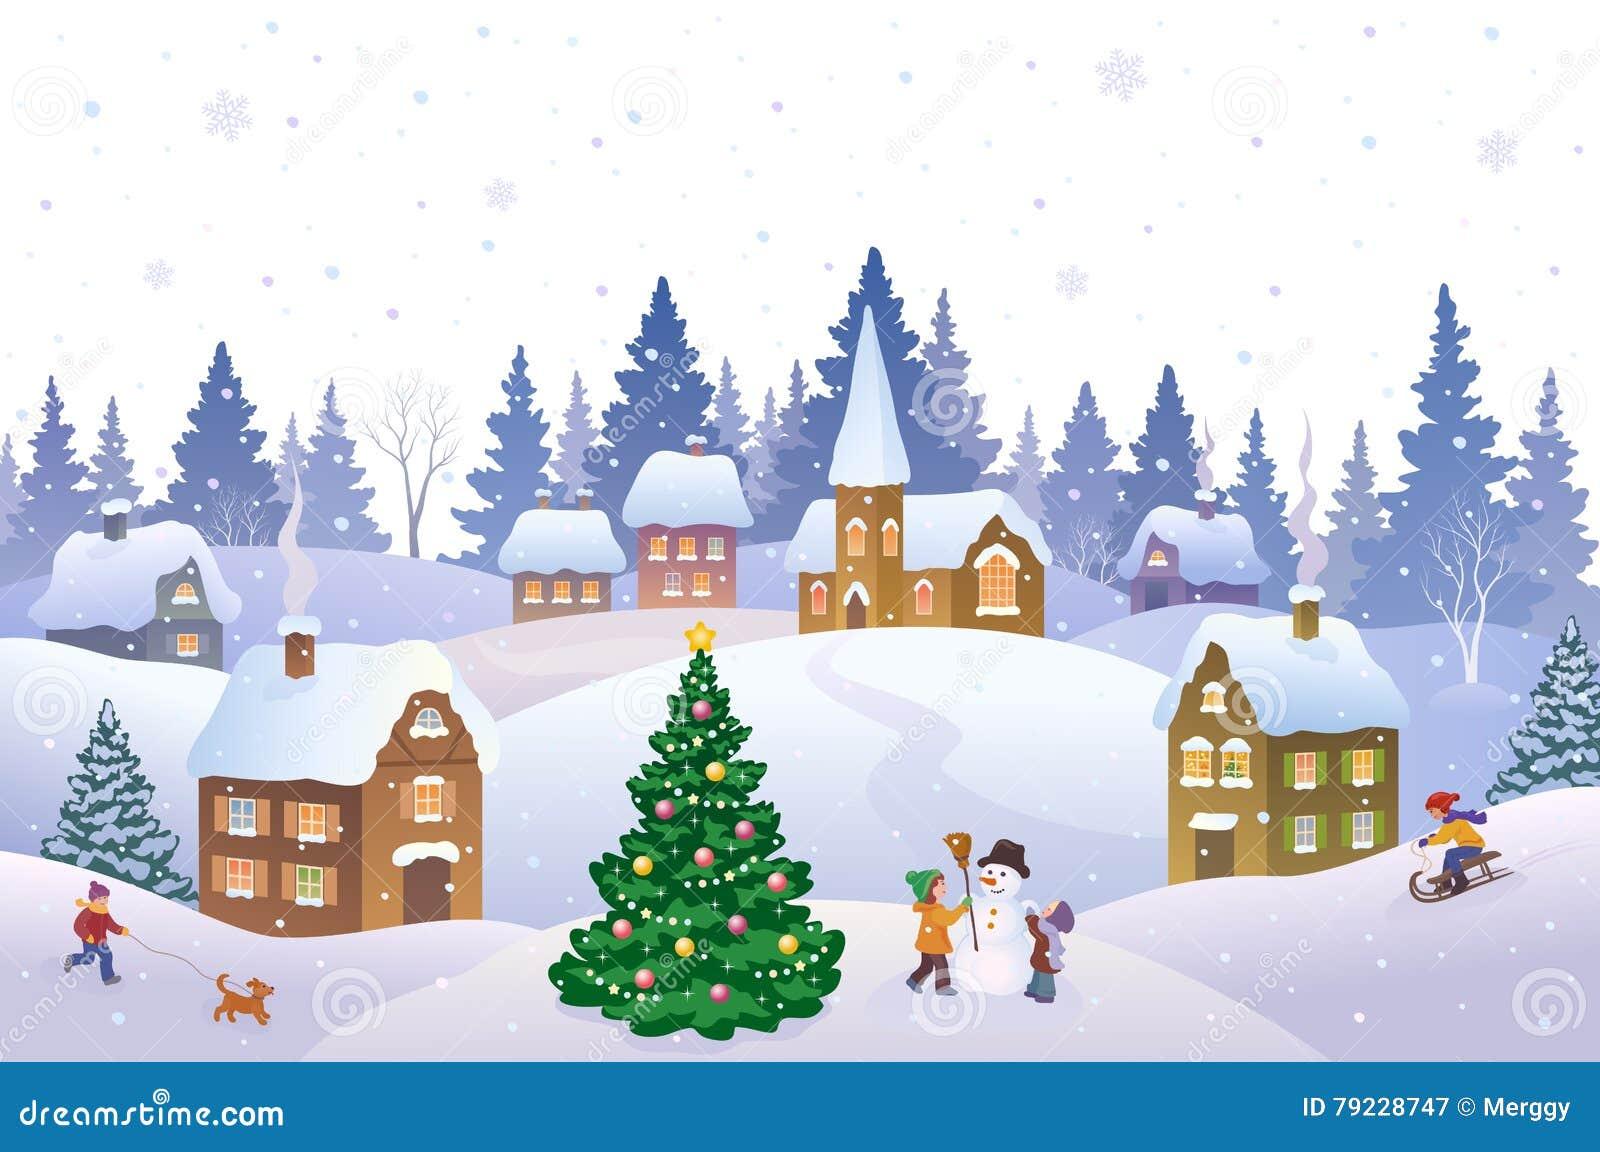 Christmas landscape stock vector. Illustration of house - 79228747